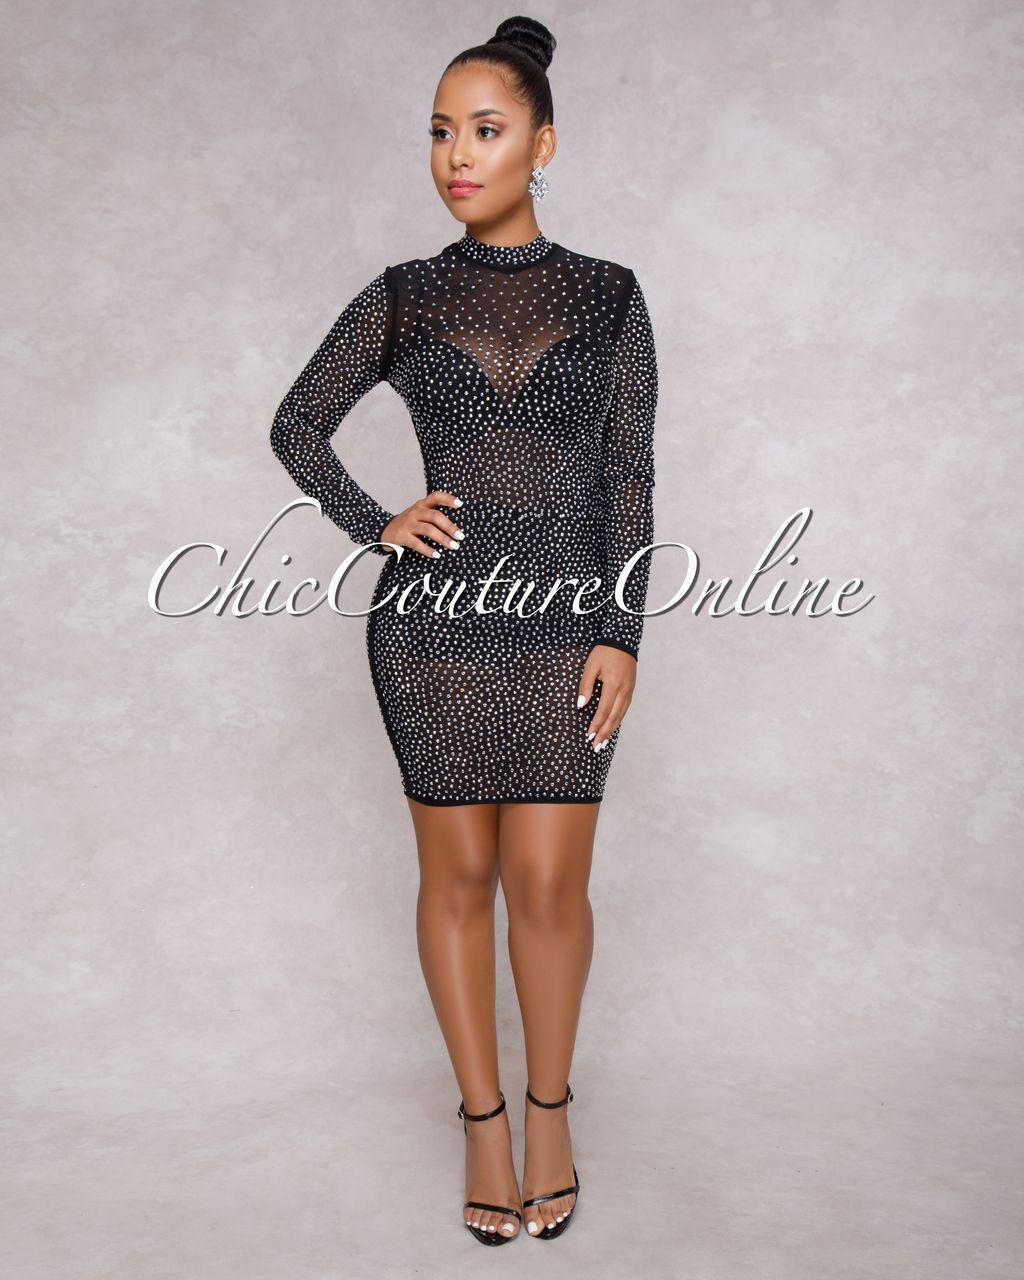 c5f8e48f44 Dacey Black Silver Rhinestones Semi-Sheer Mesh Dress